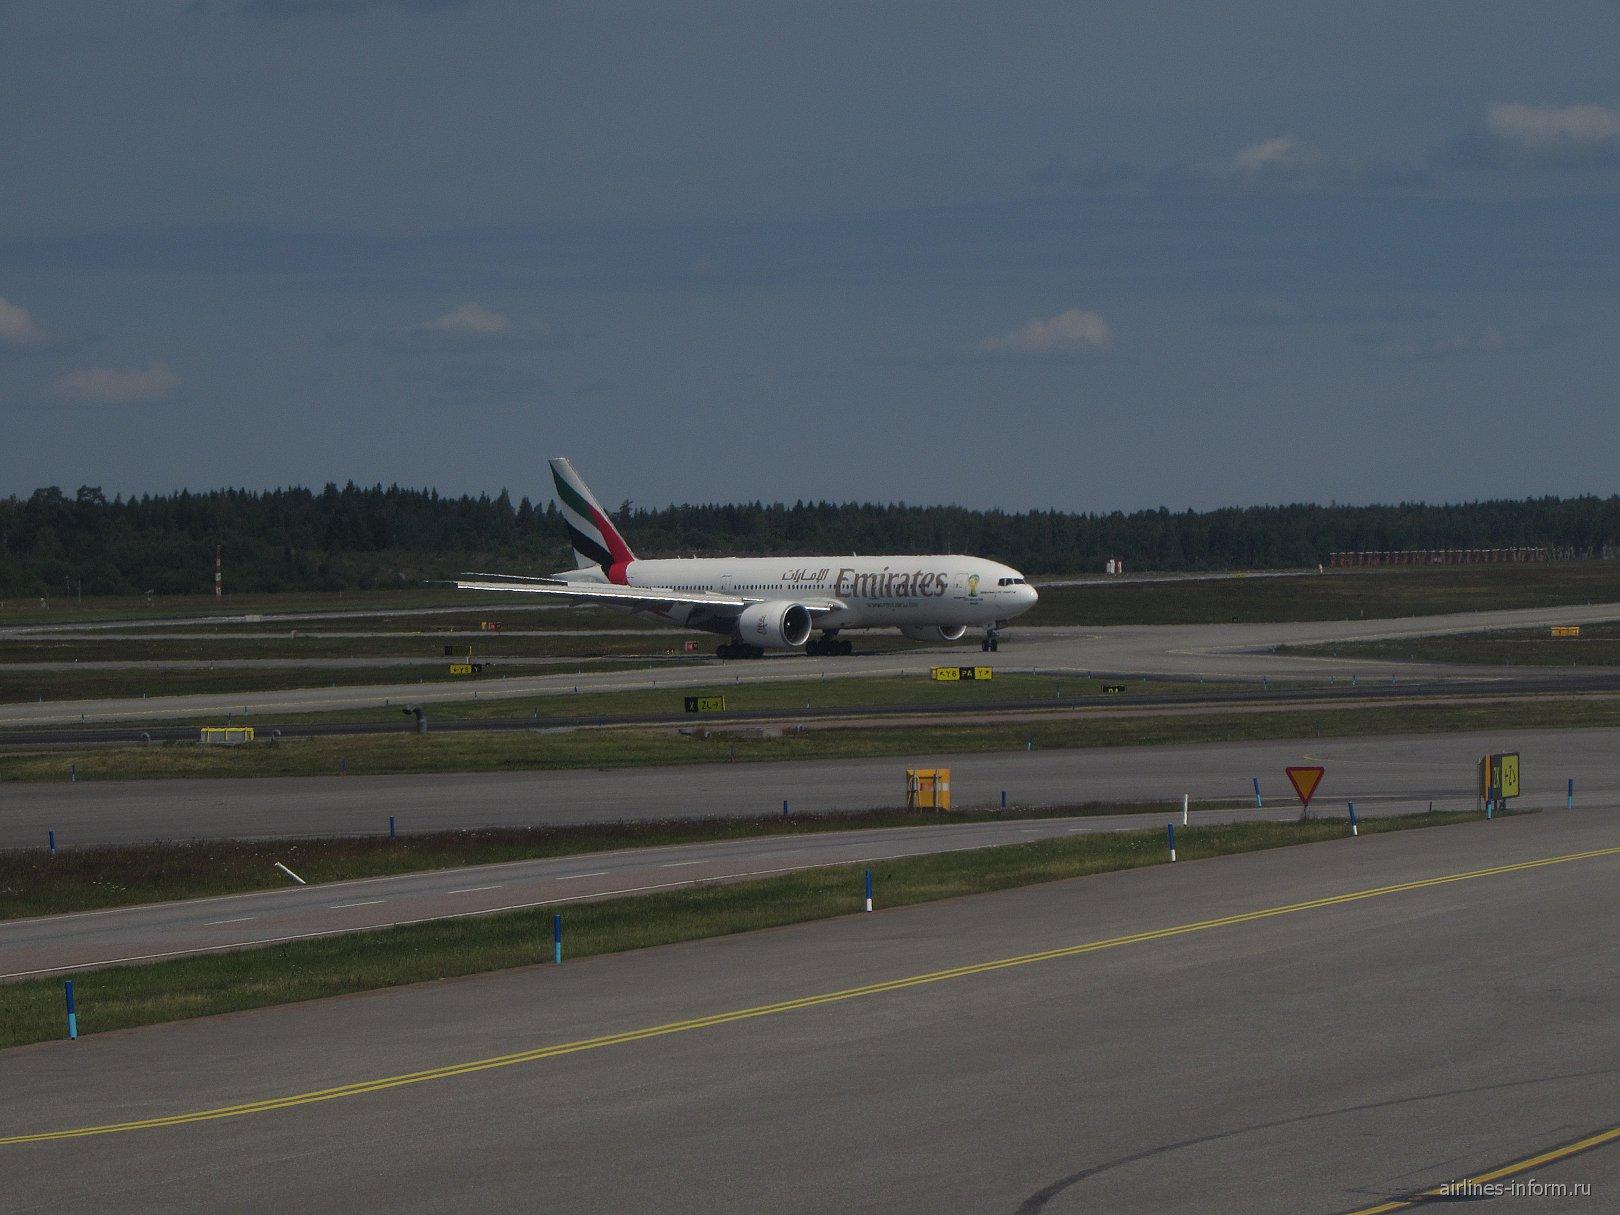 Boeing 777-200LR авиакомпании Emirates в аэропорту Арланда